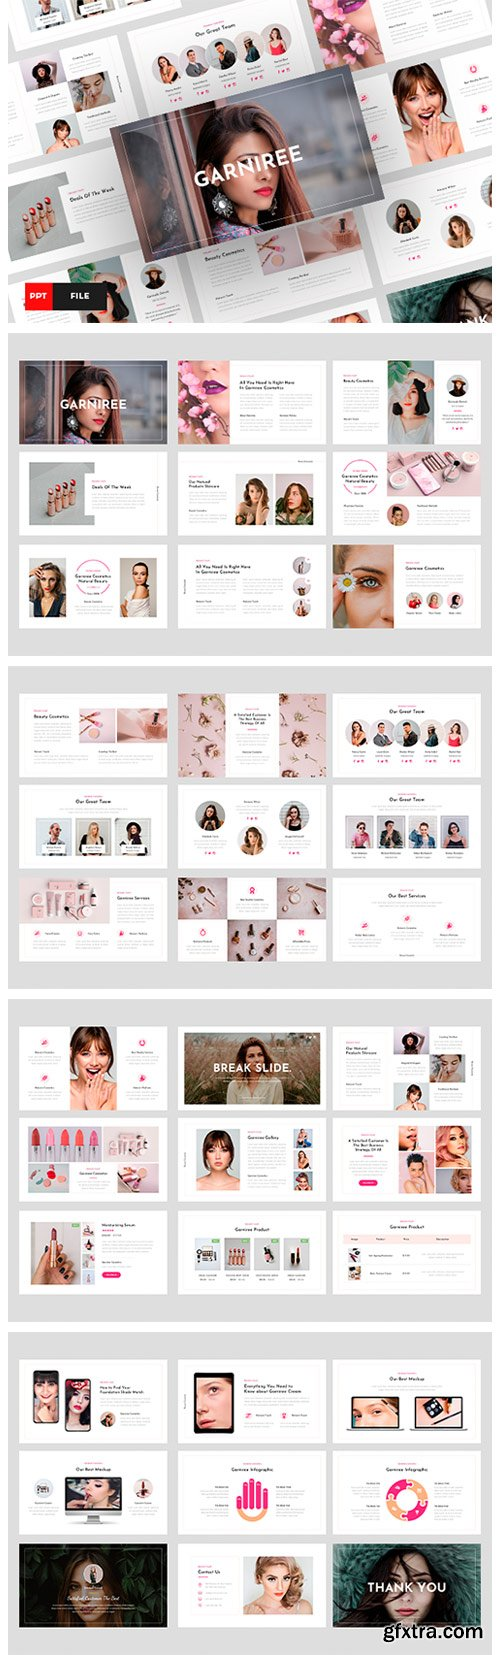 Garniree - Beauty & Cosmetics PowerPoint 6797700